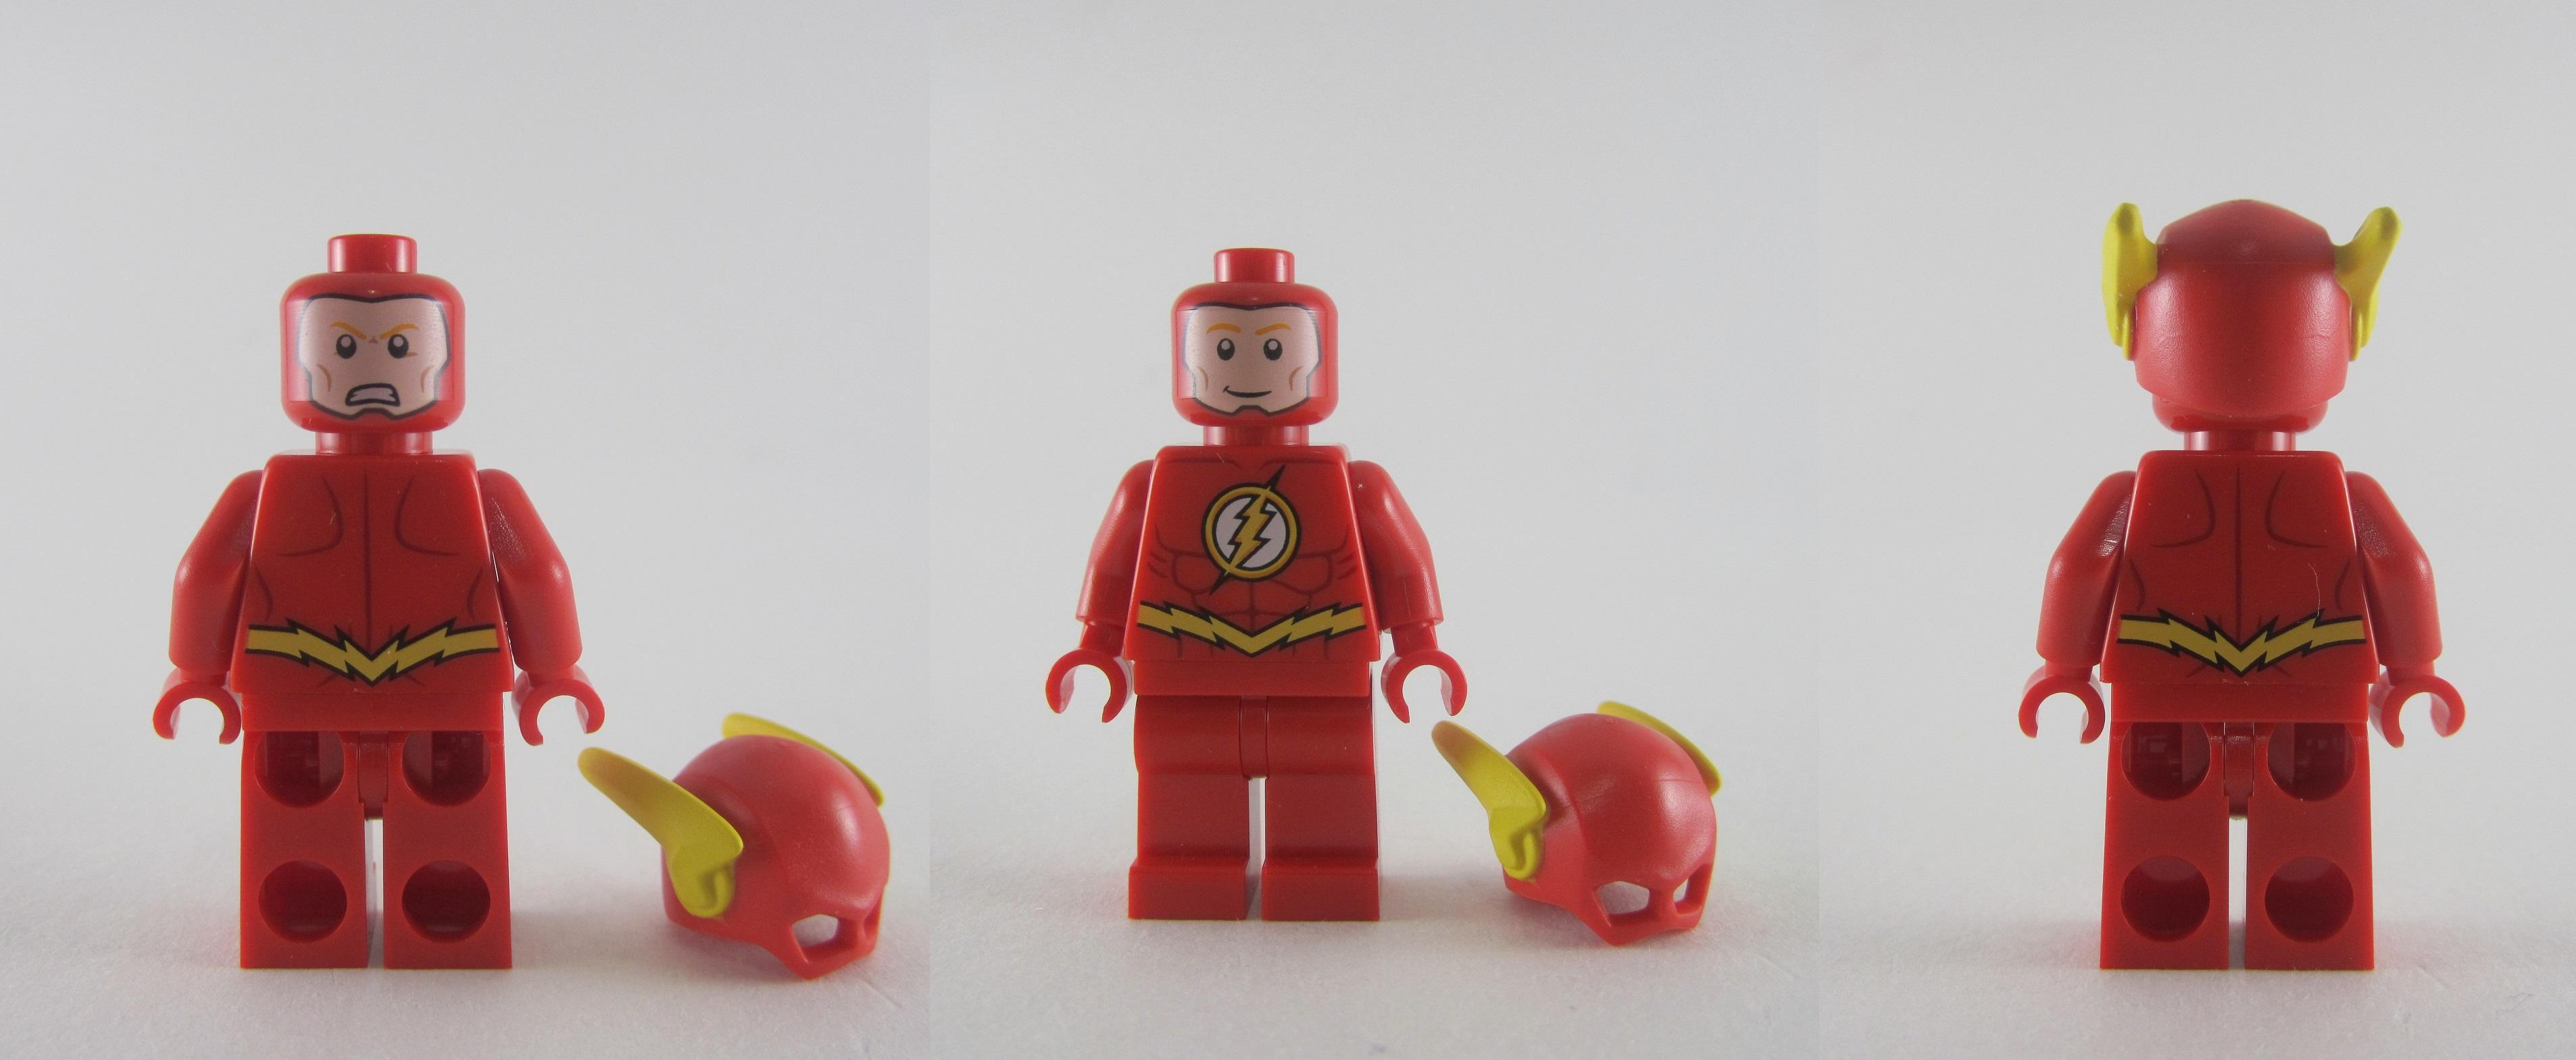 Review Lego 76012 Batman The Riddler Chase Jays Brick Blog